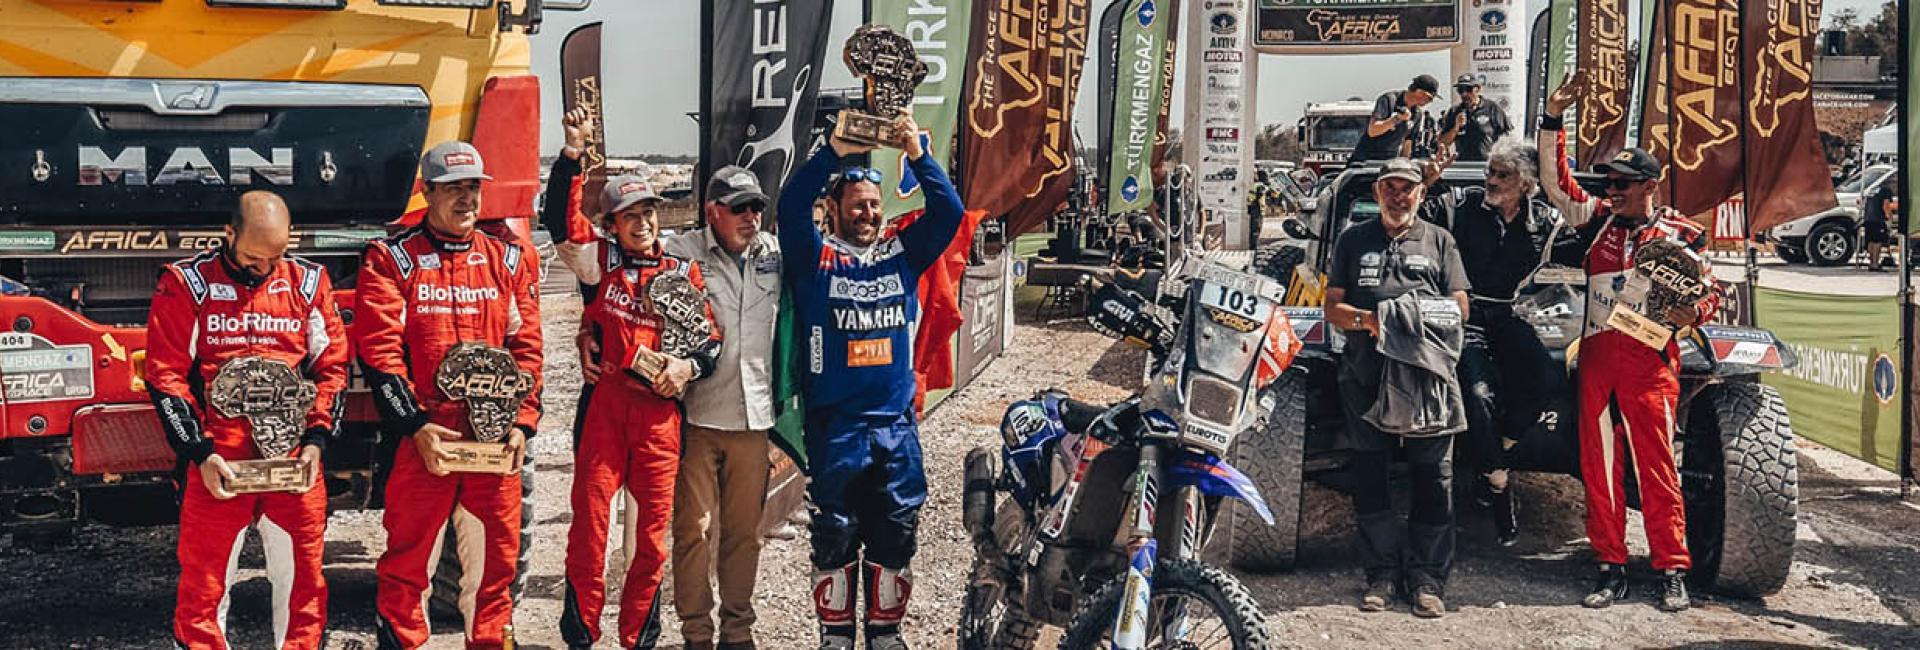 Calendario Ama Motocross 2020.Africa Eco Race